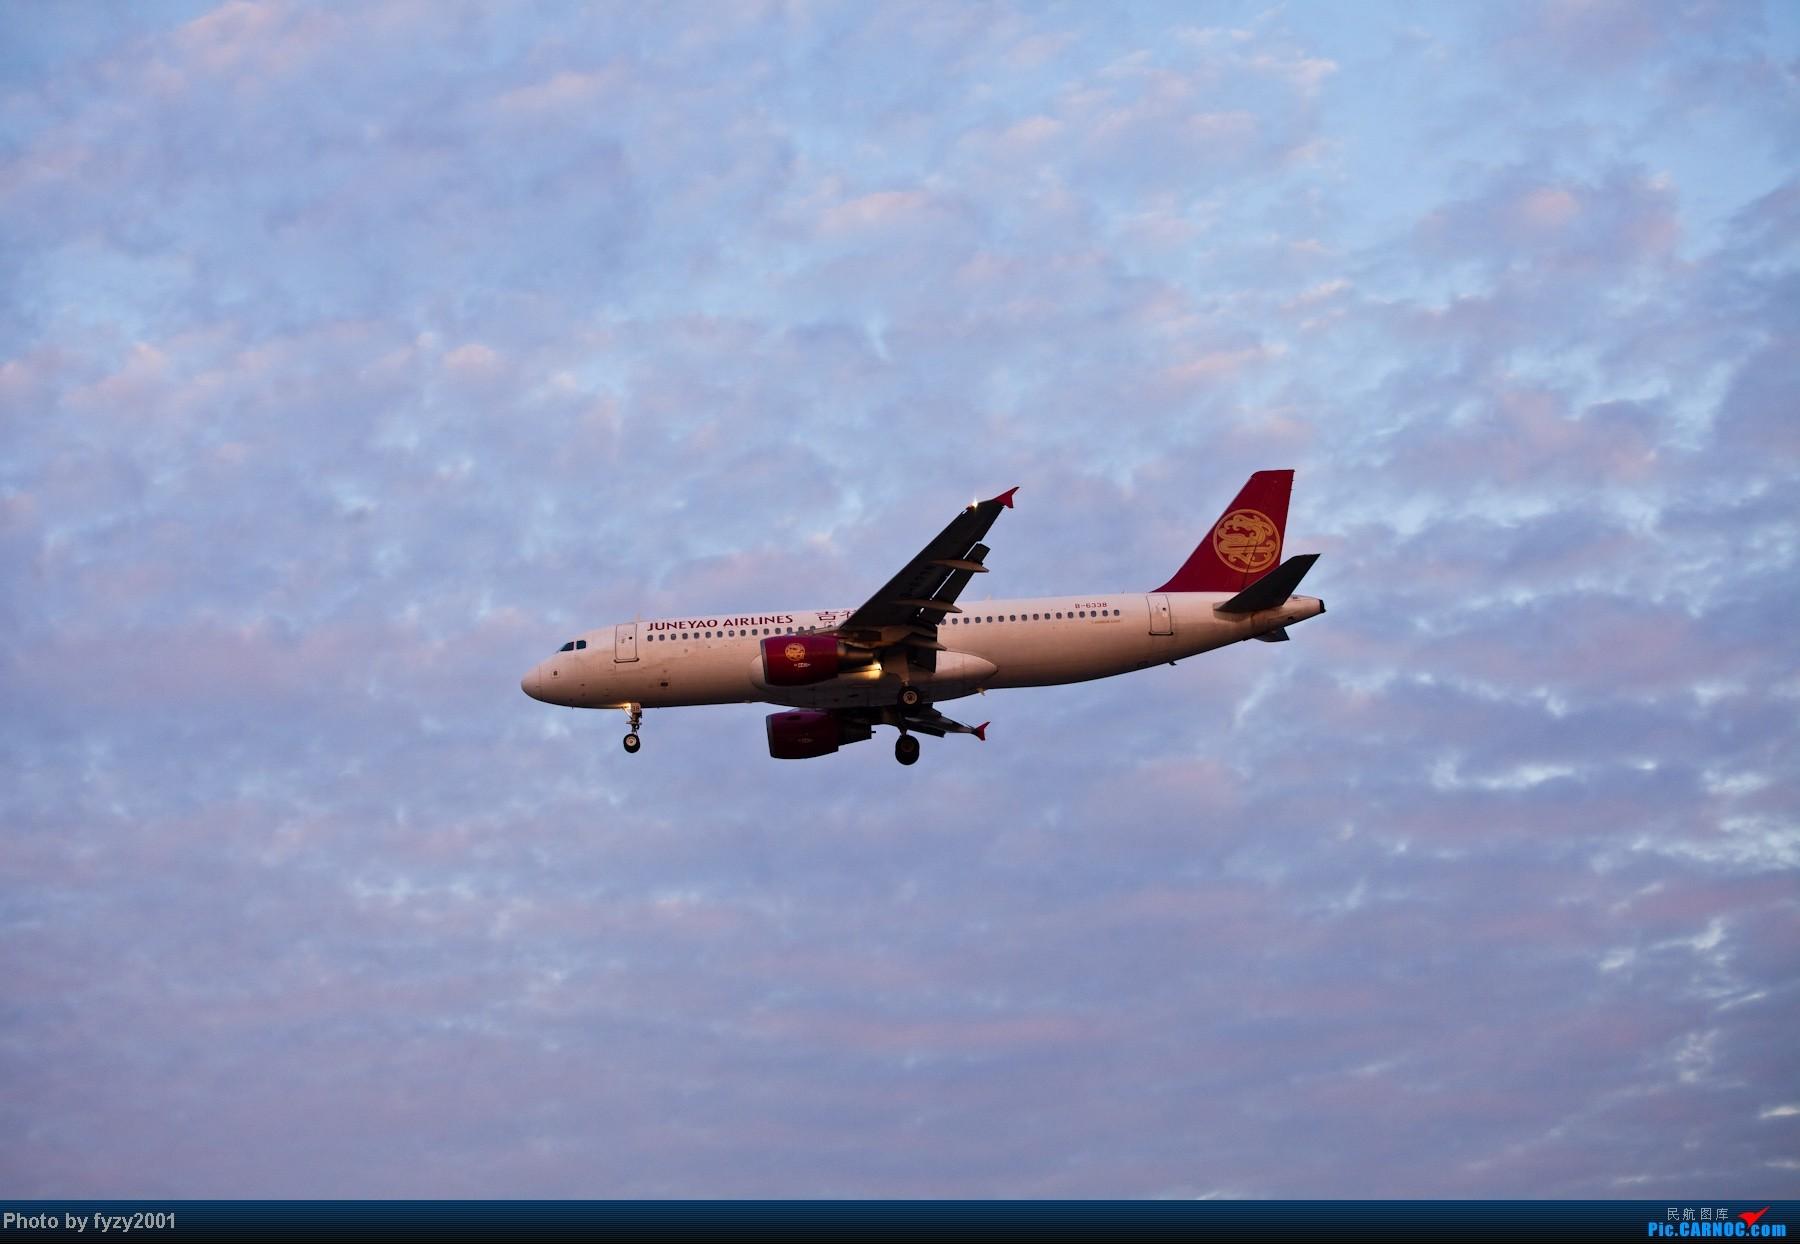 Re:[原创][无锡西站]追逐光影的脚步(1800大图) AIRBUS A320-200 B-6338 中国上海虹桥机场